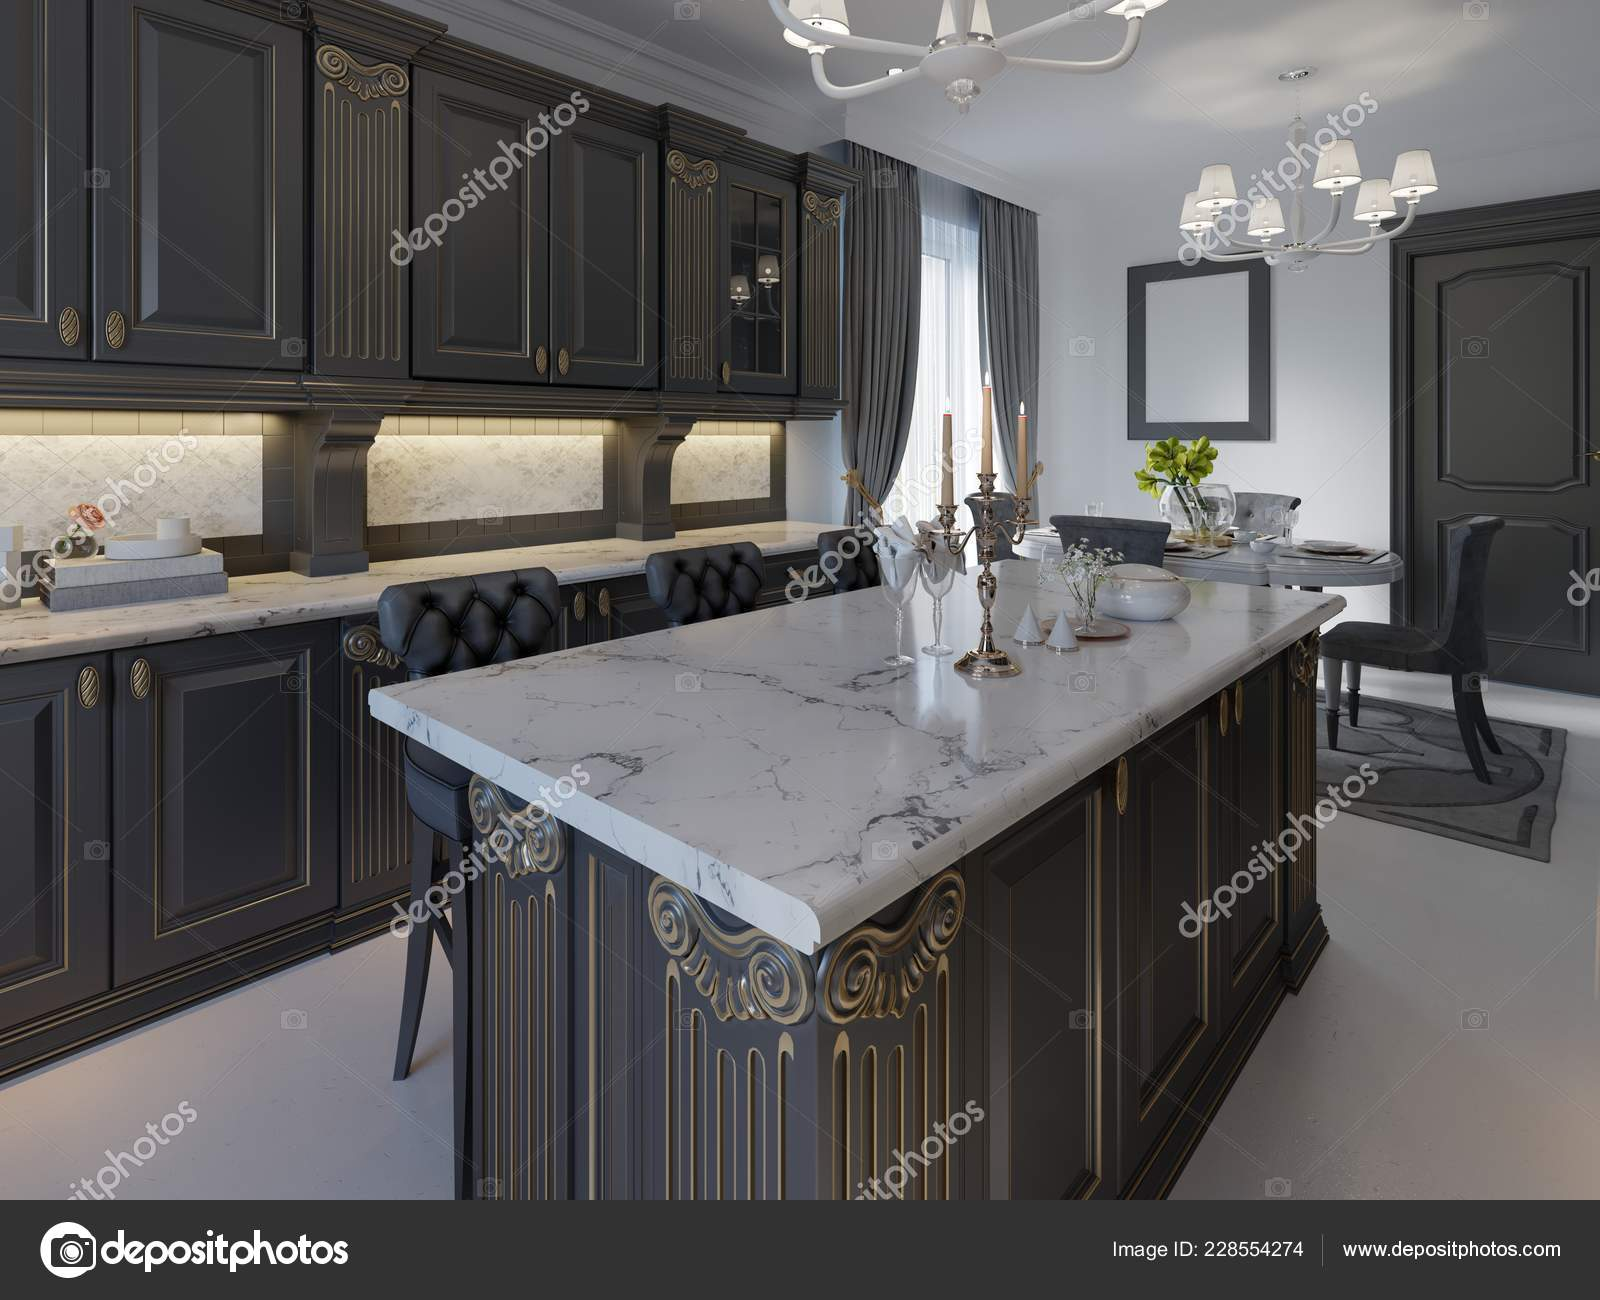 Picture of: Black Bar Stools Kitchen Island Bright Living Room Rendering Stock Photo C Kuprin33 228554274